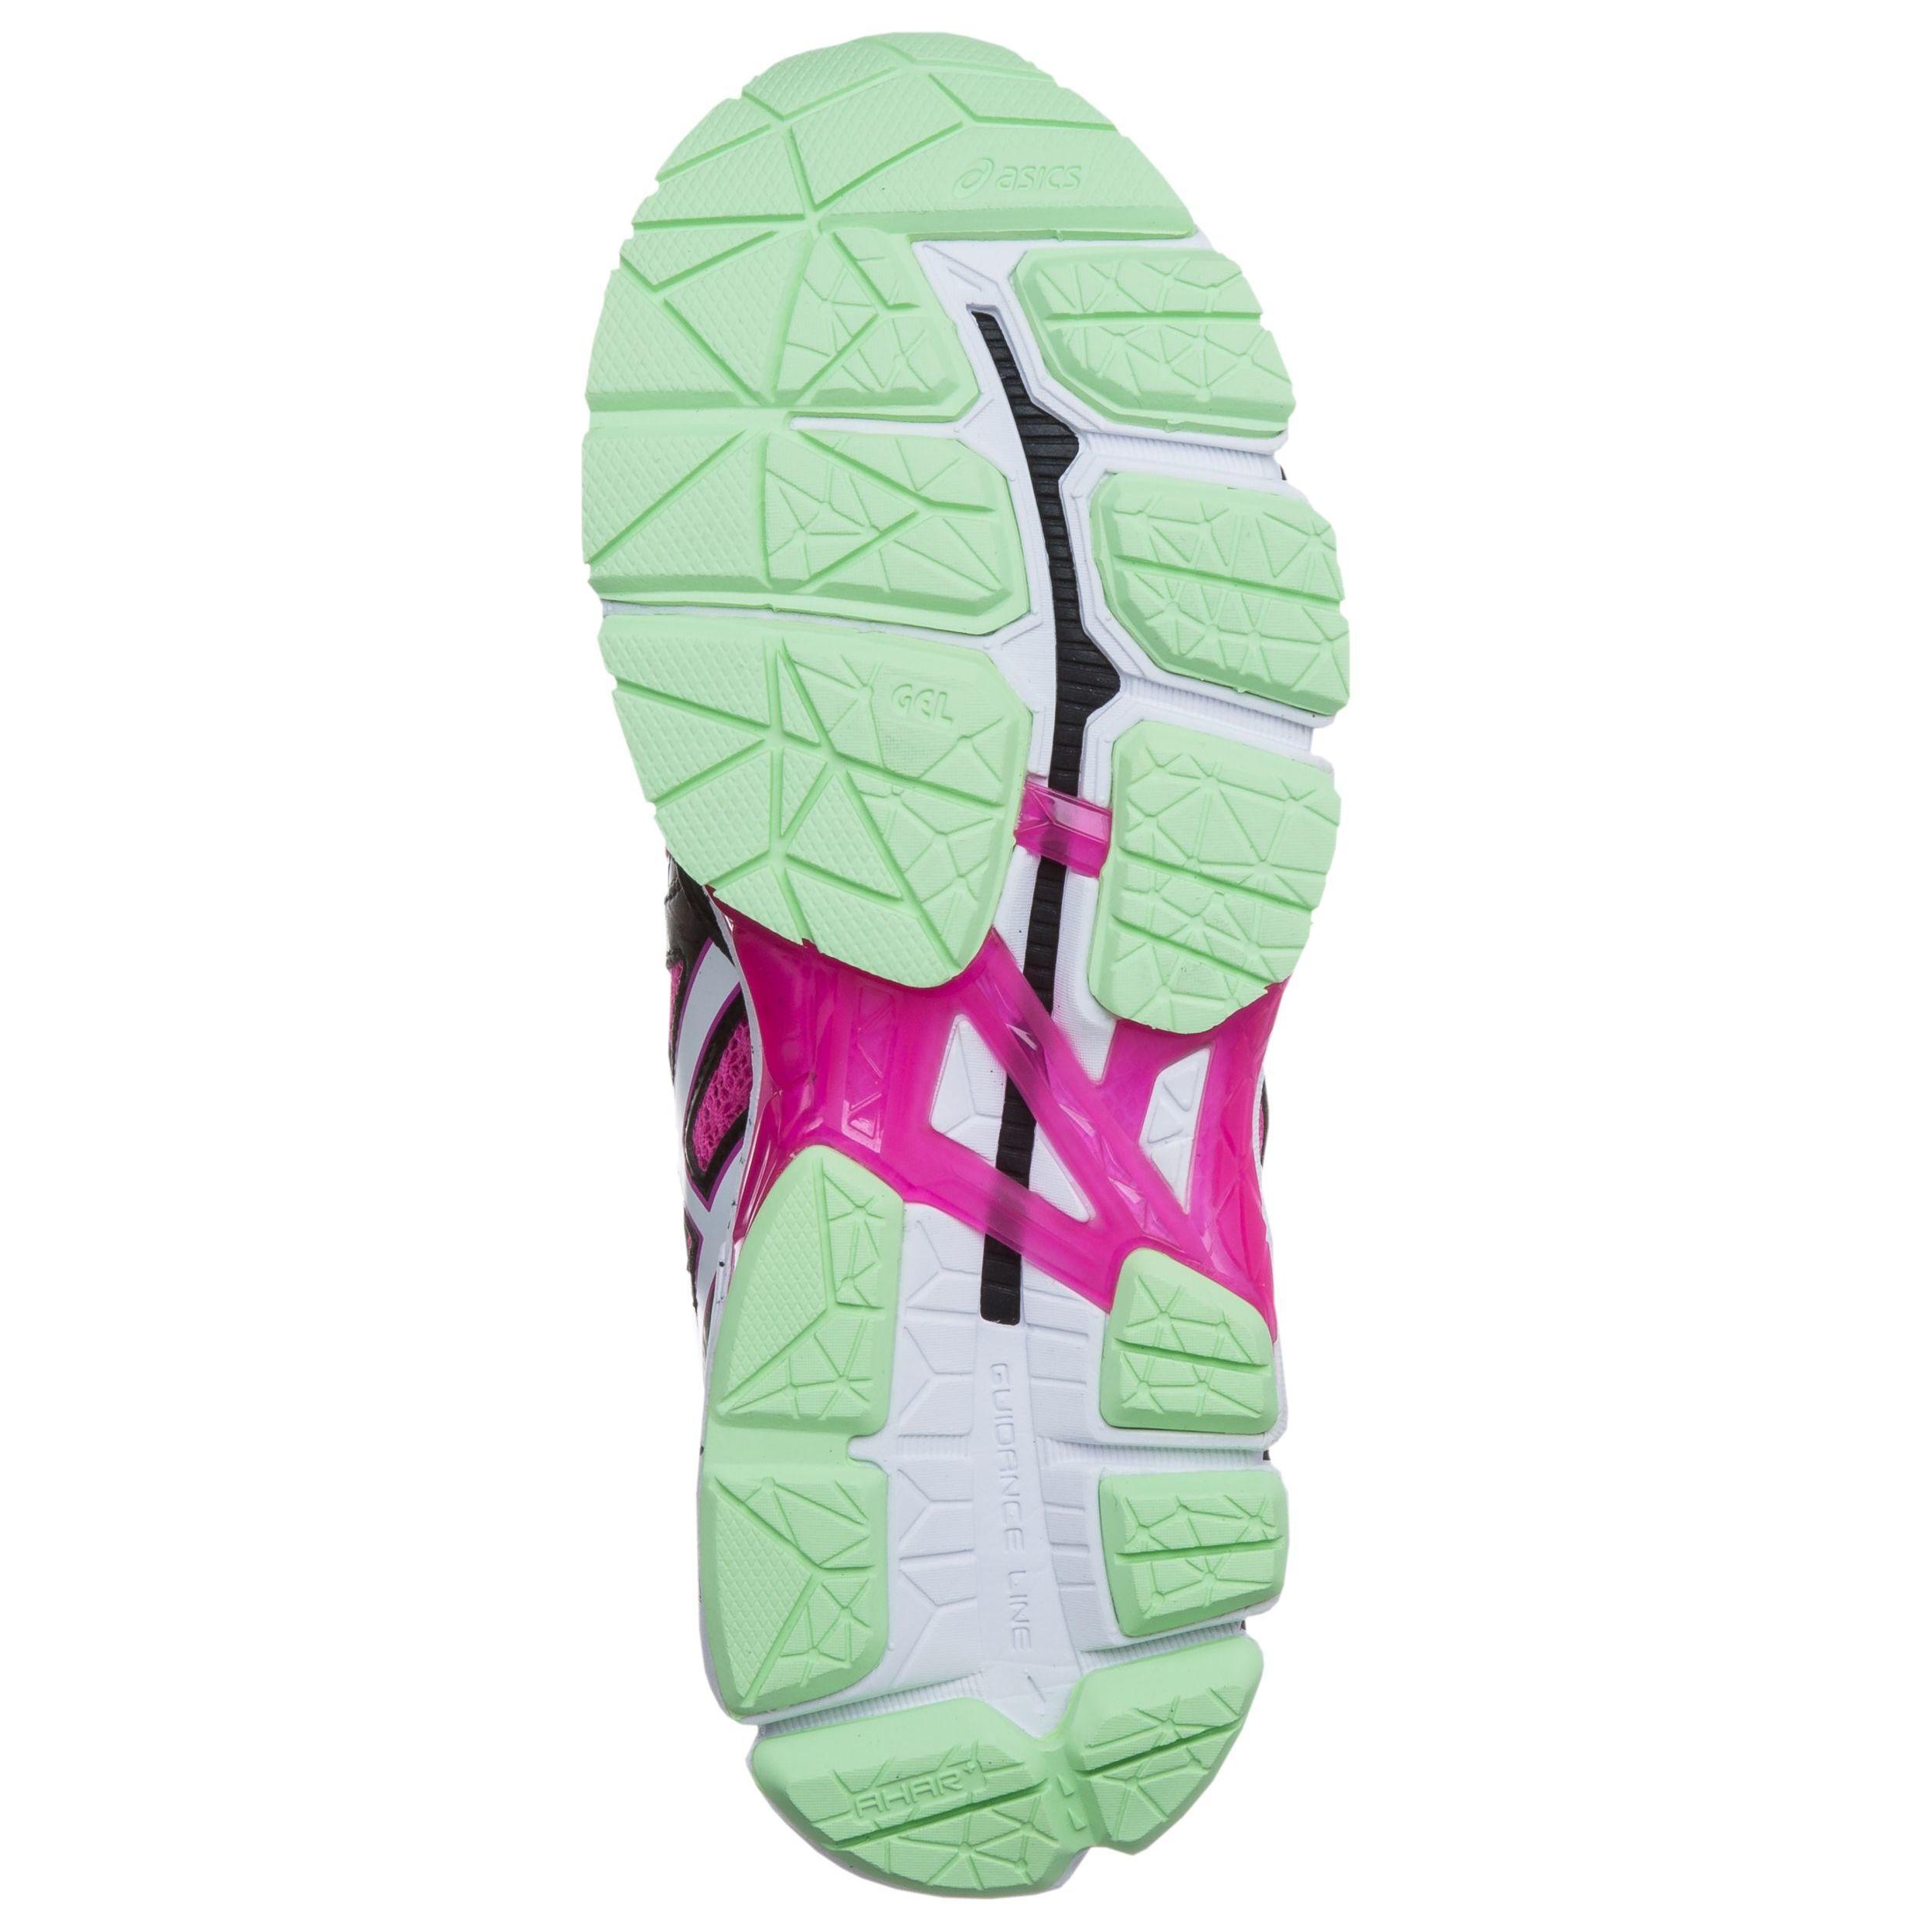 Asics GT 3000 3 Stabilitätsschuh Damen Pink, Weiß online